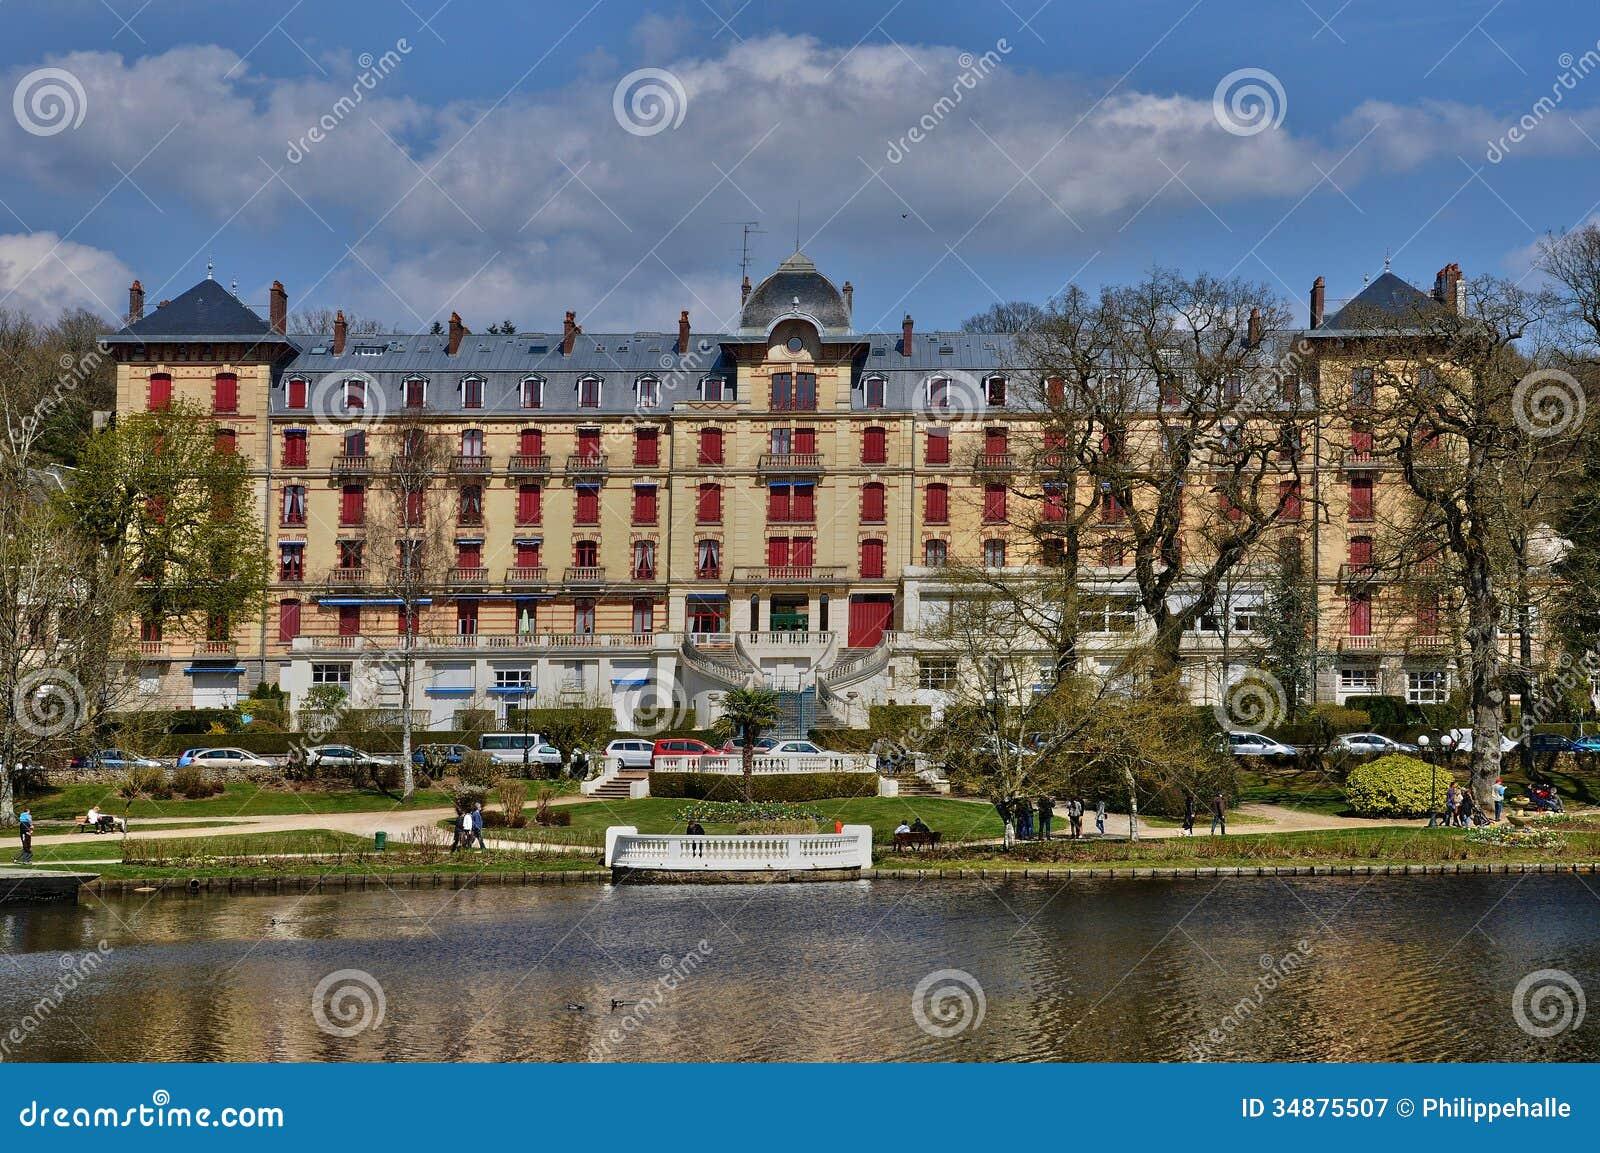 Bagnoles de l orne in normandie royalty free stock for Design hotel normandie france